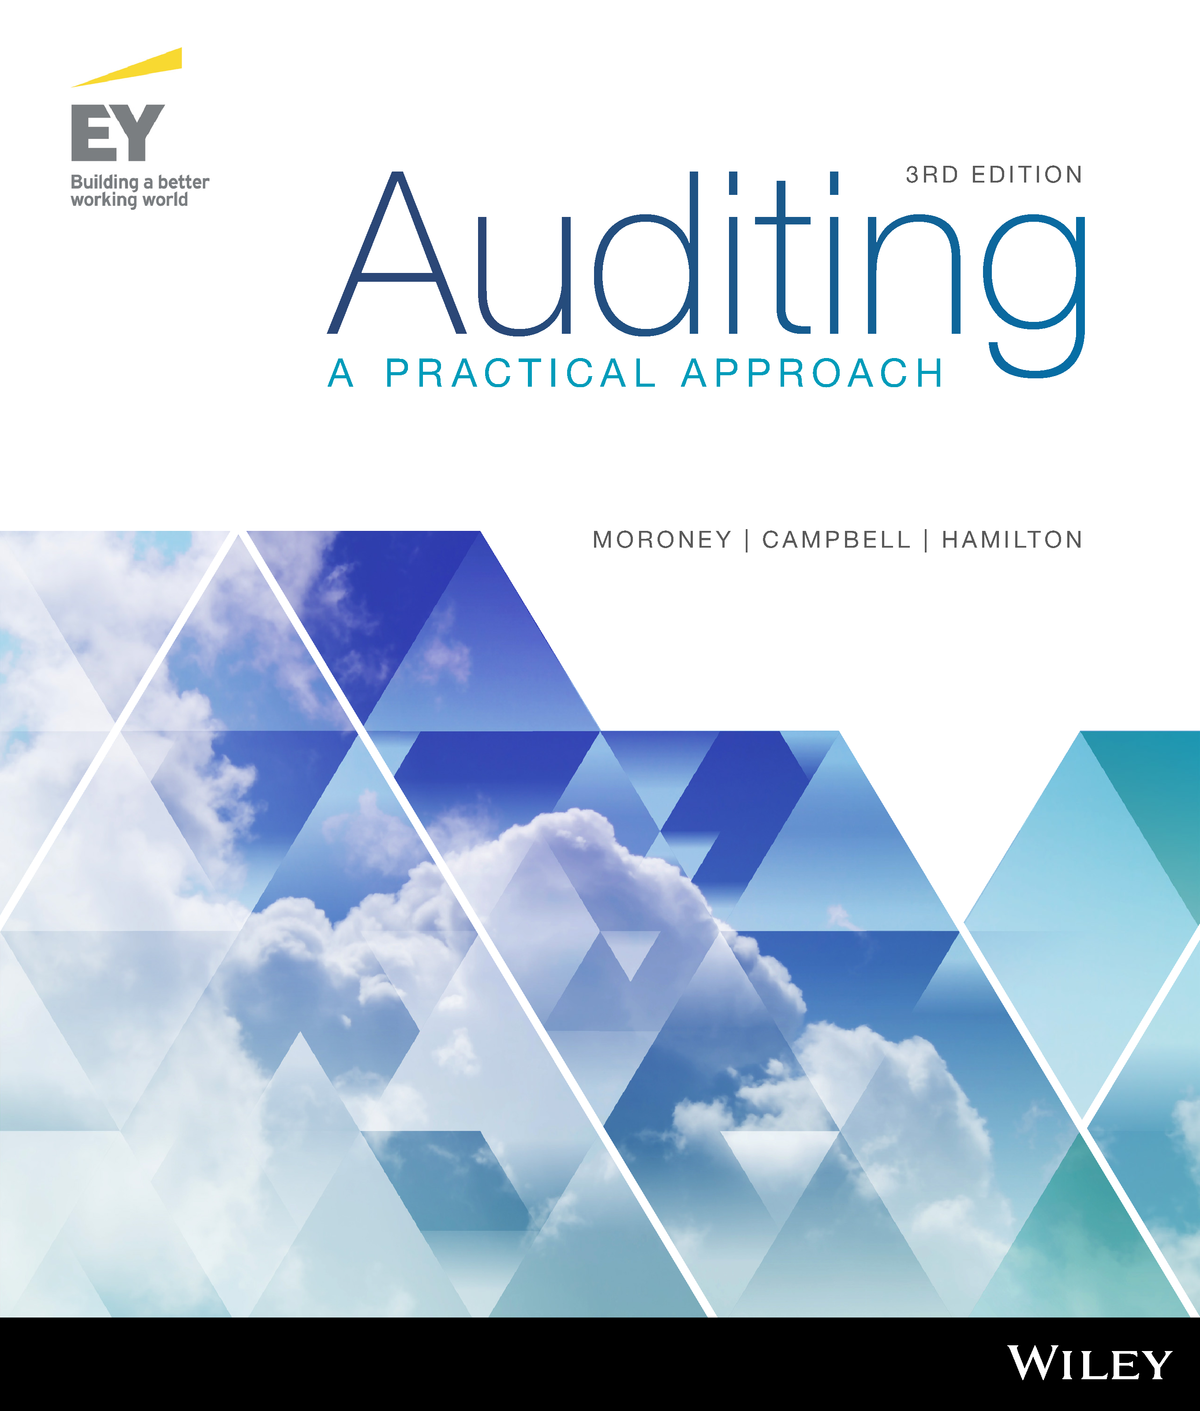 Auditing A Practical Approach 3E - 200535 - UWS - StuDocu